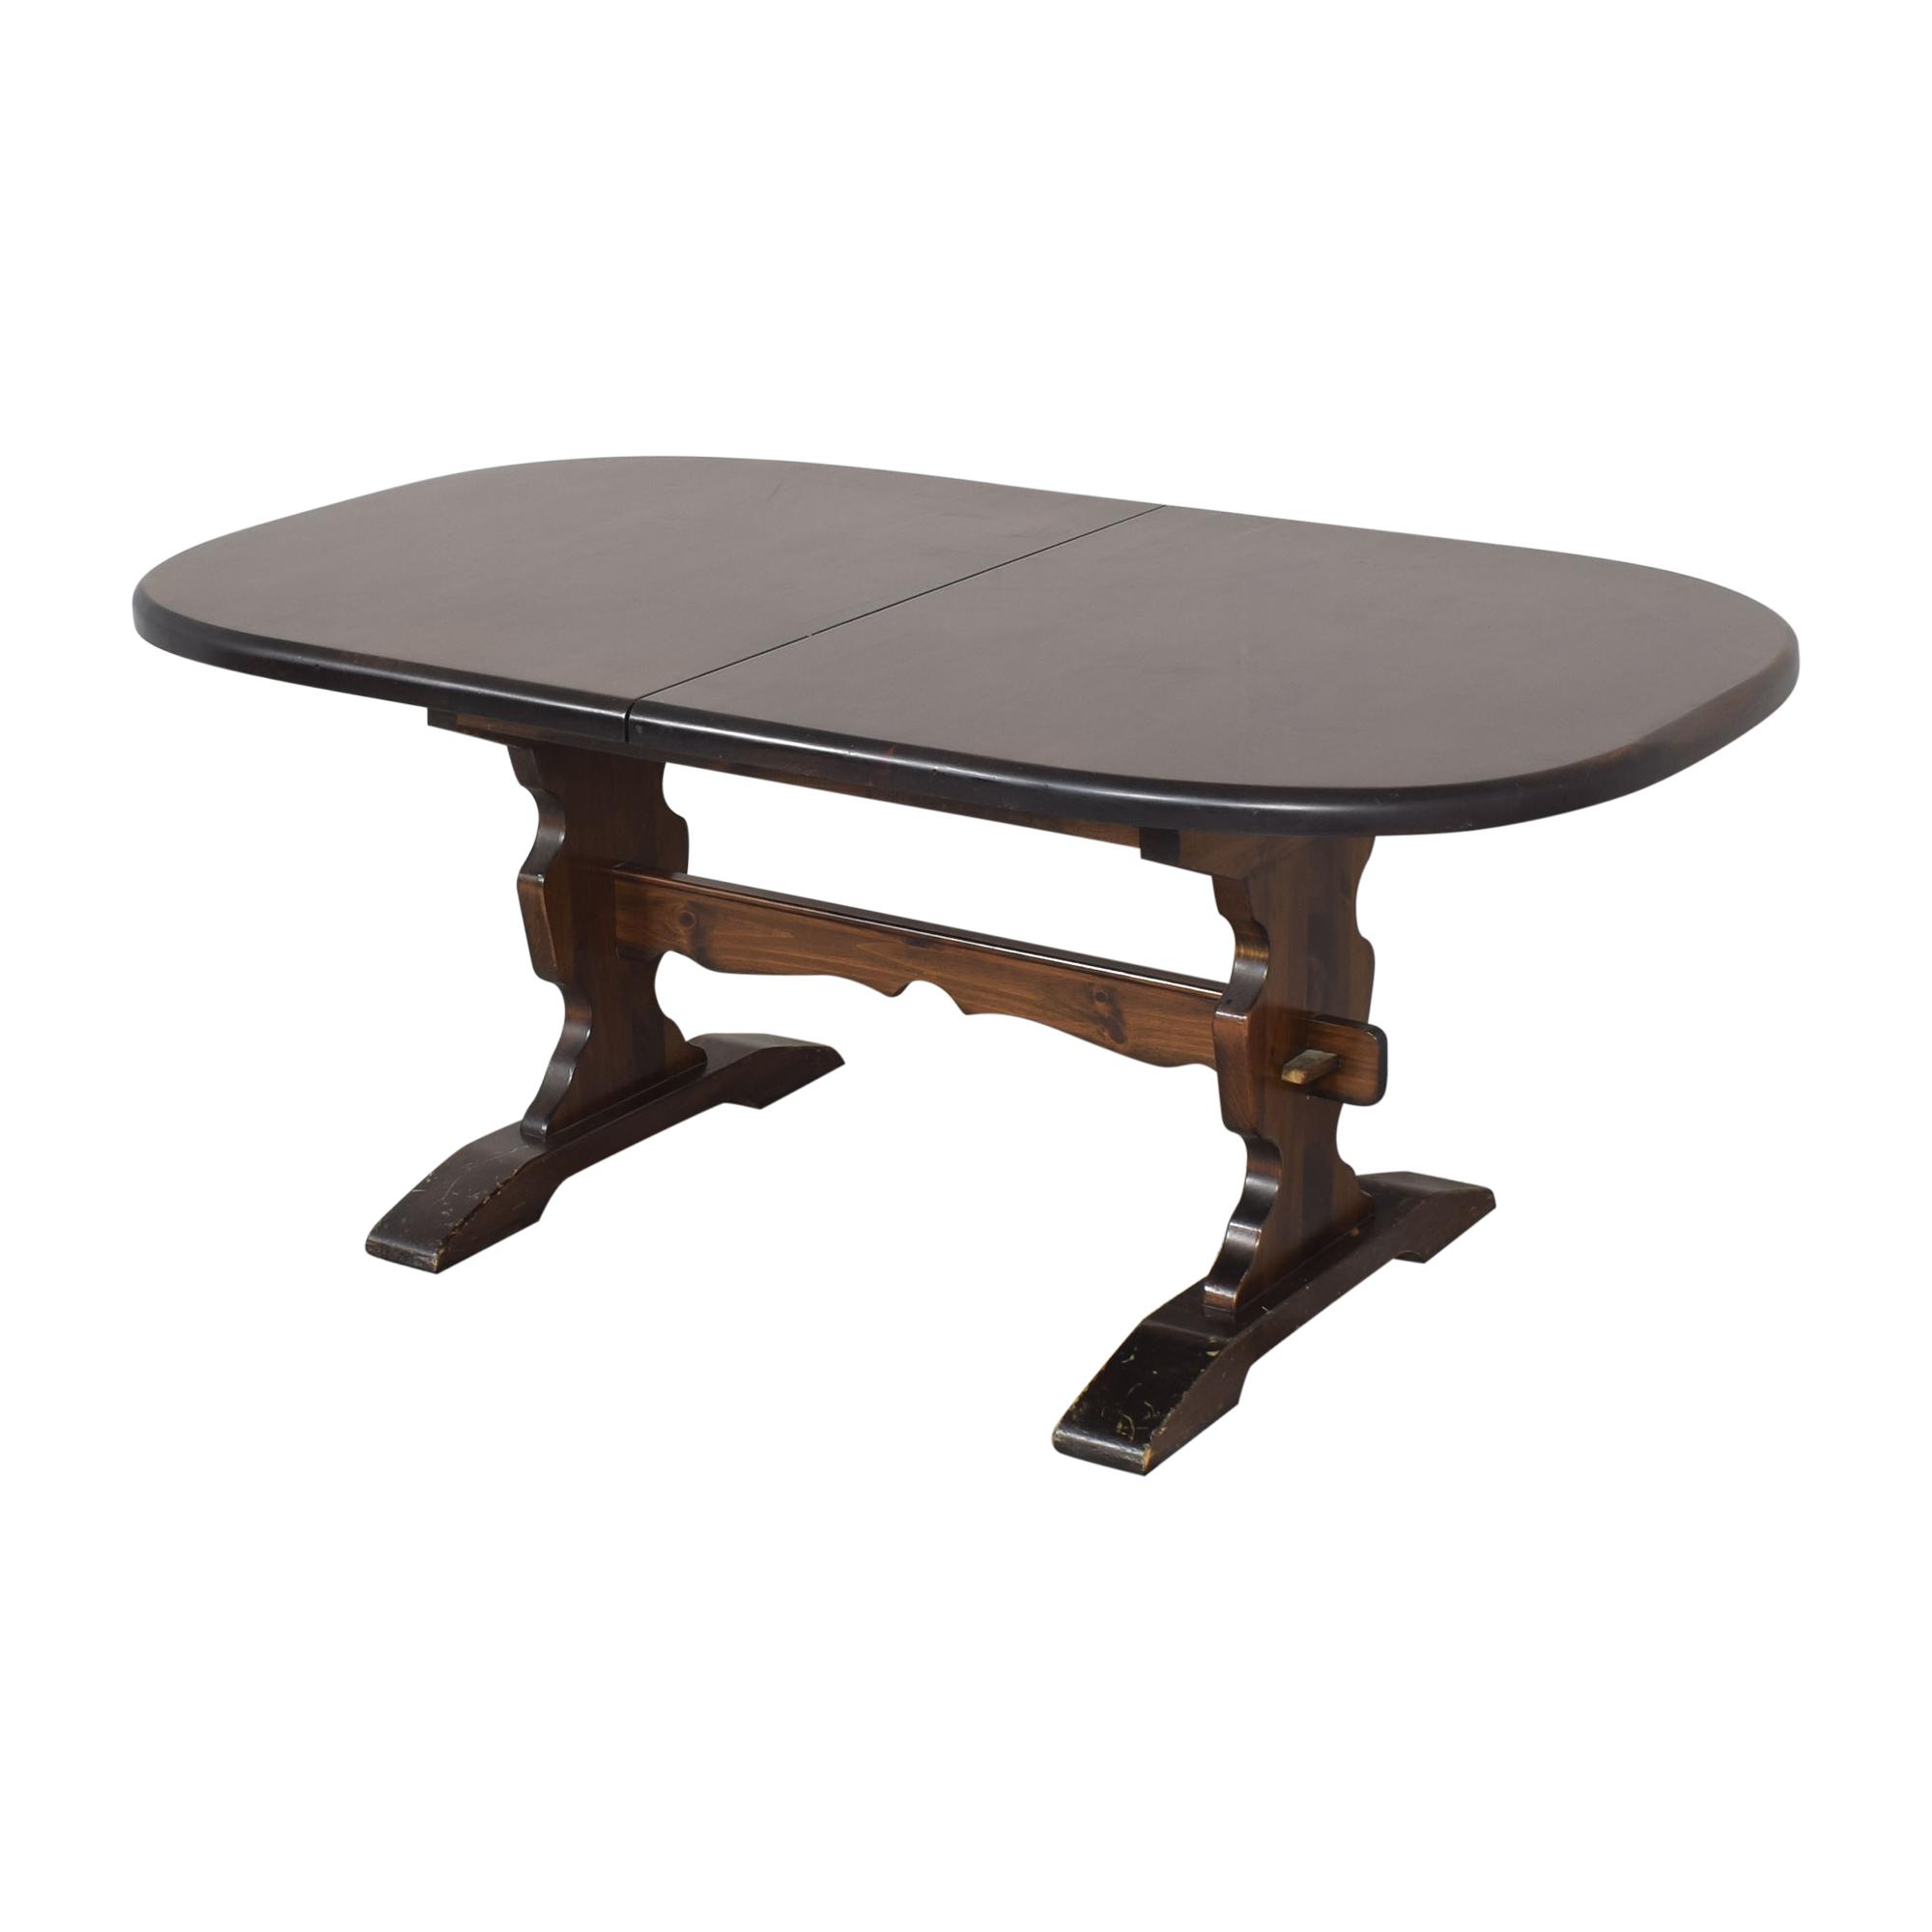 Bennington Pine Bennington Pine Extendable Trestle Dining Table nj